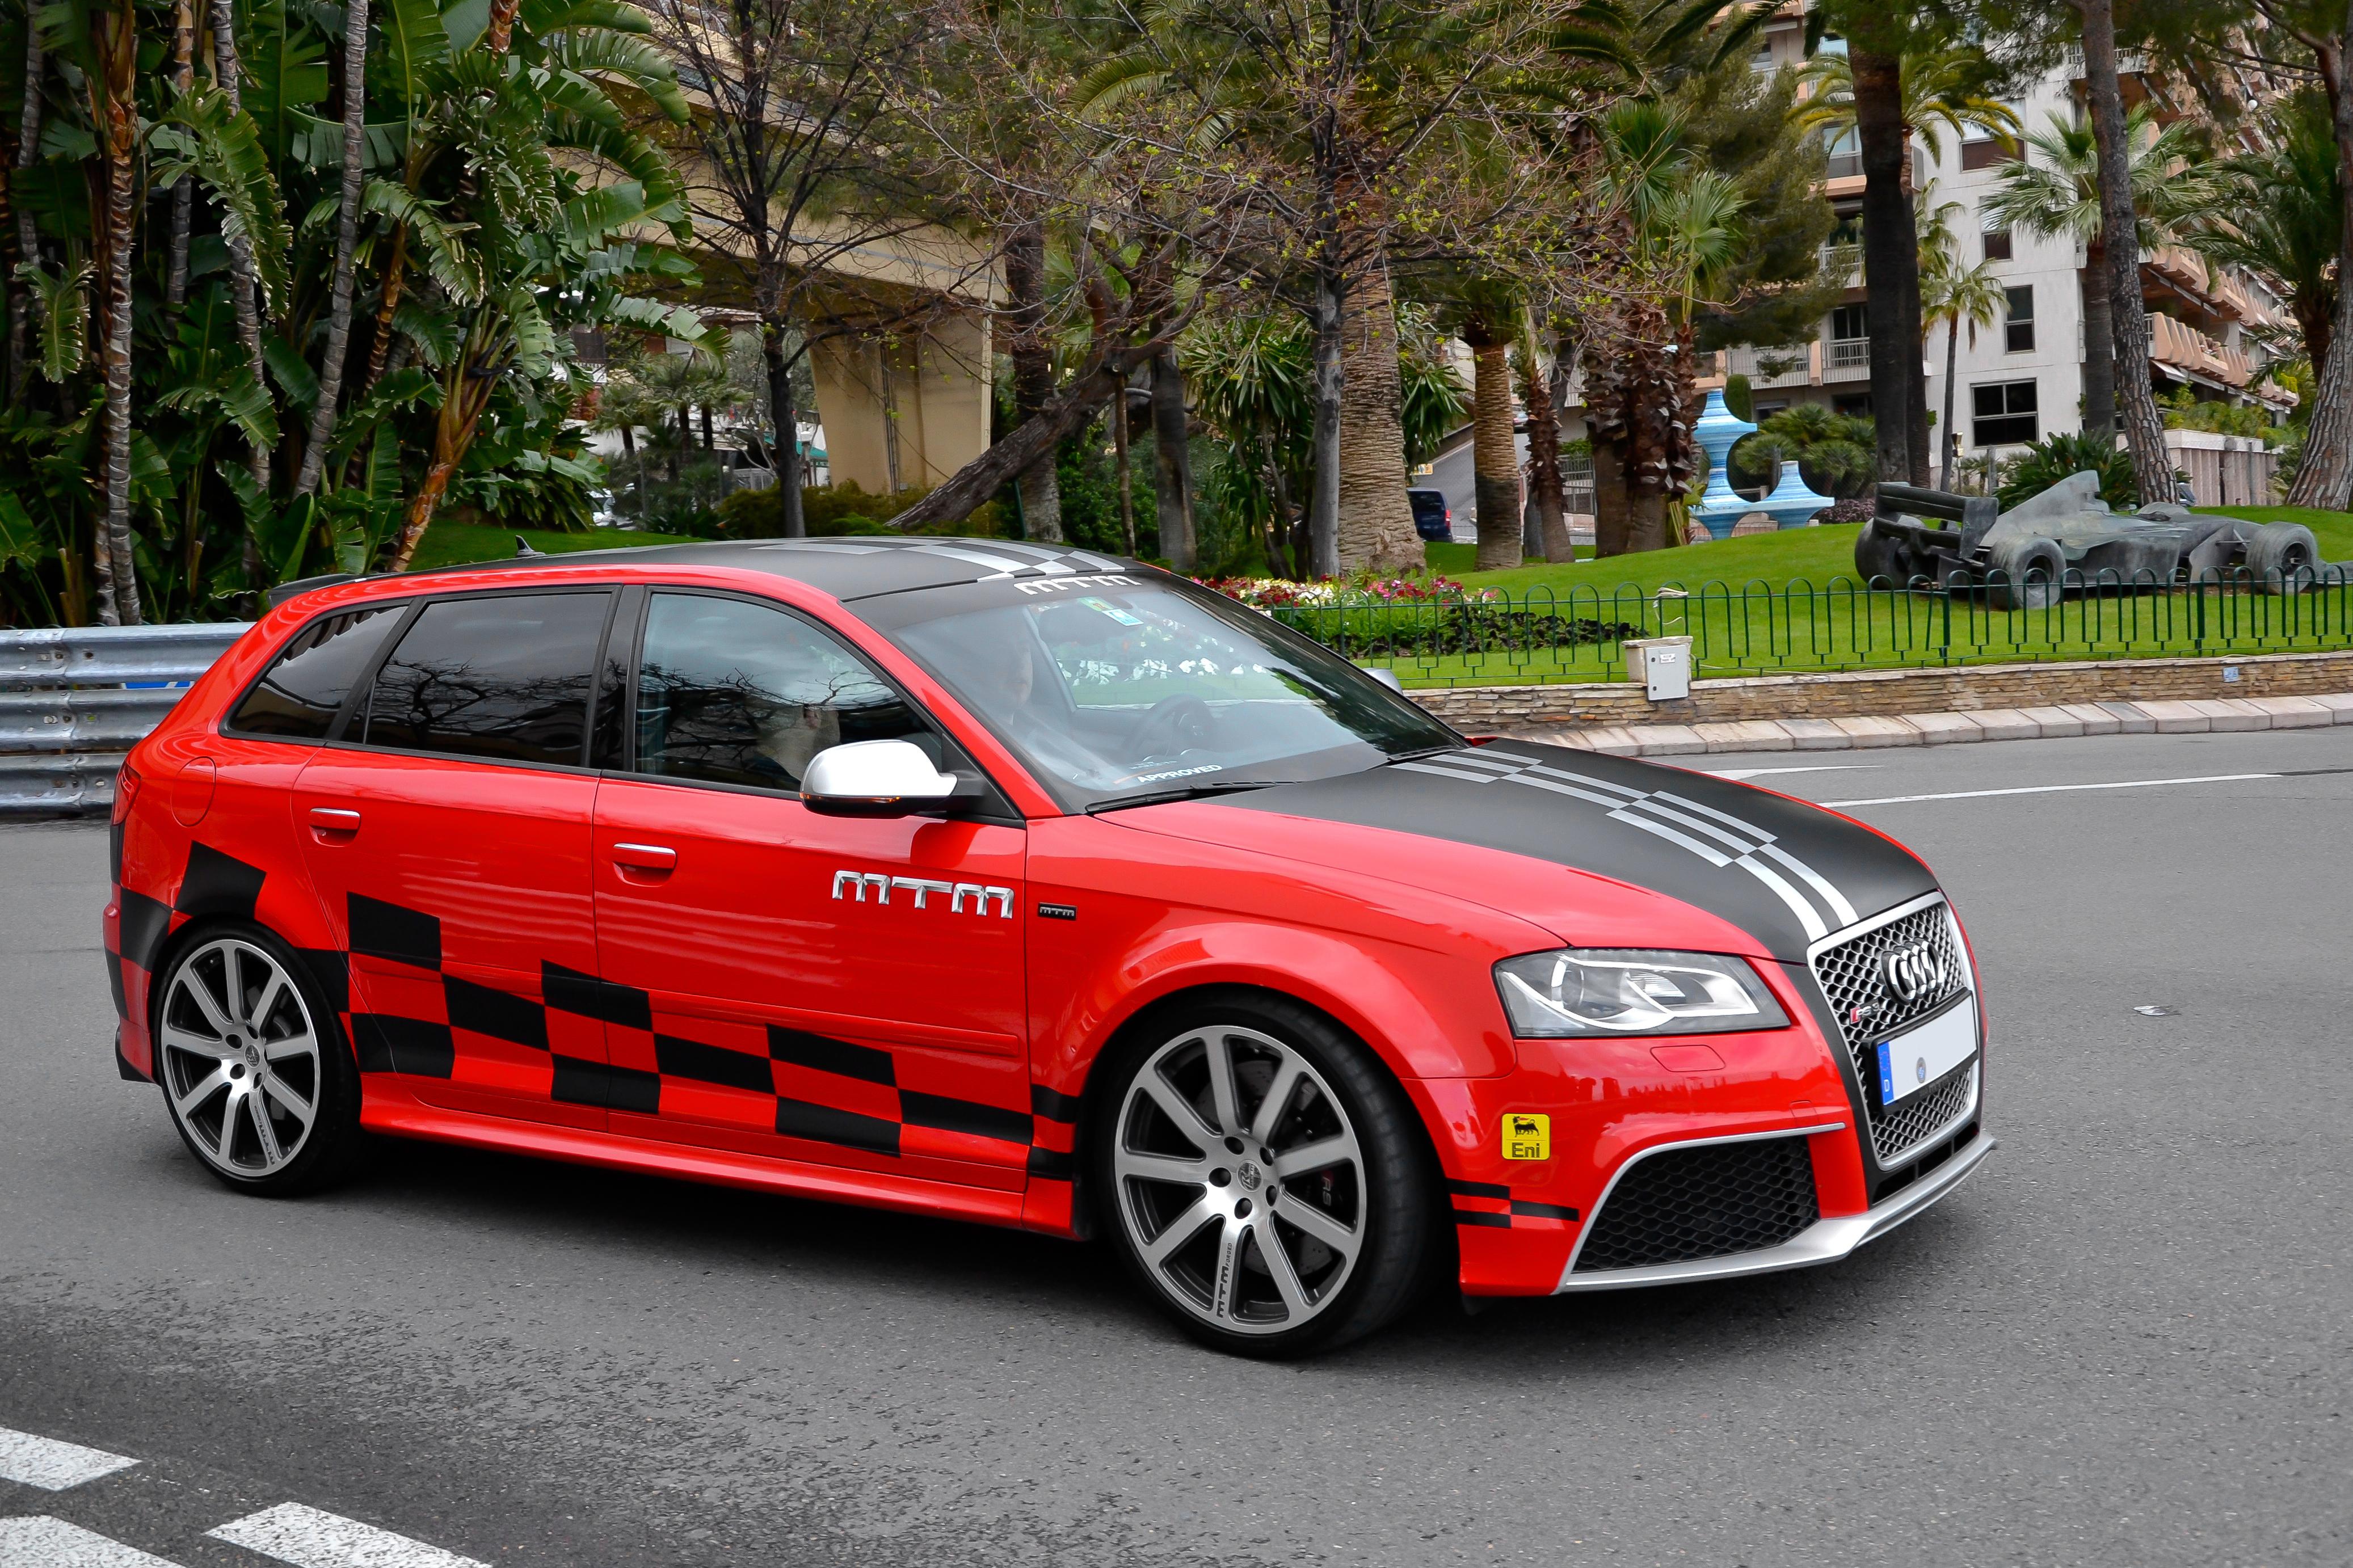 Audi rs3 wiki 15